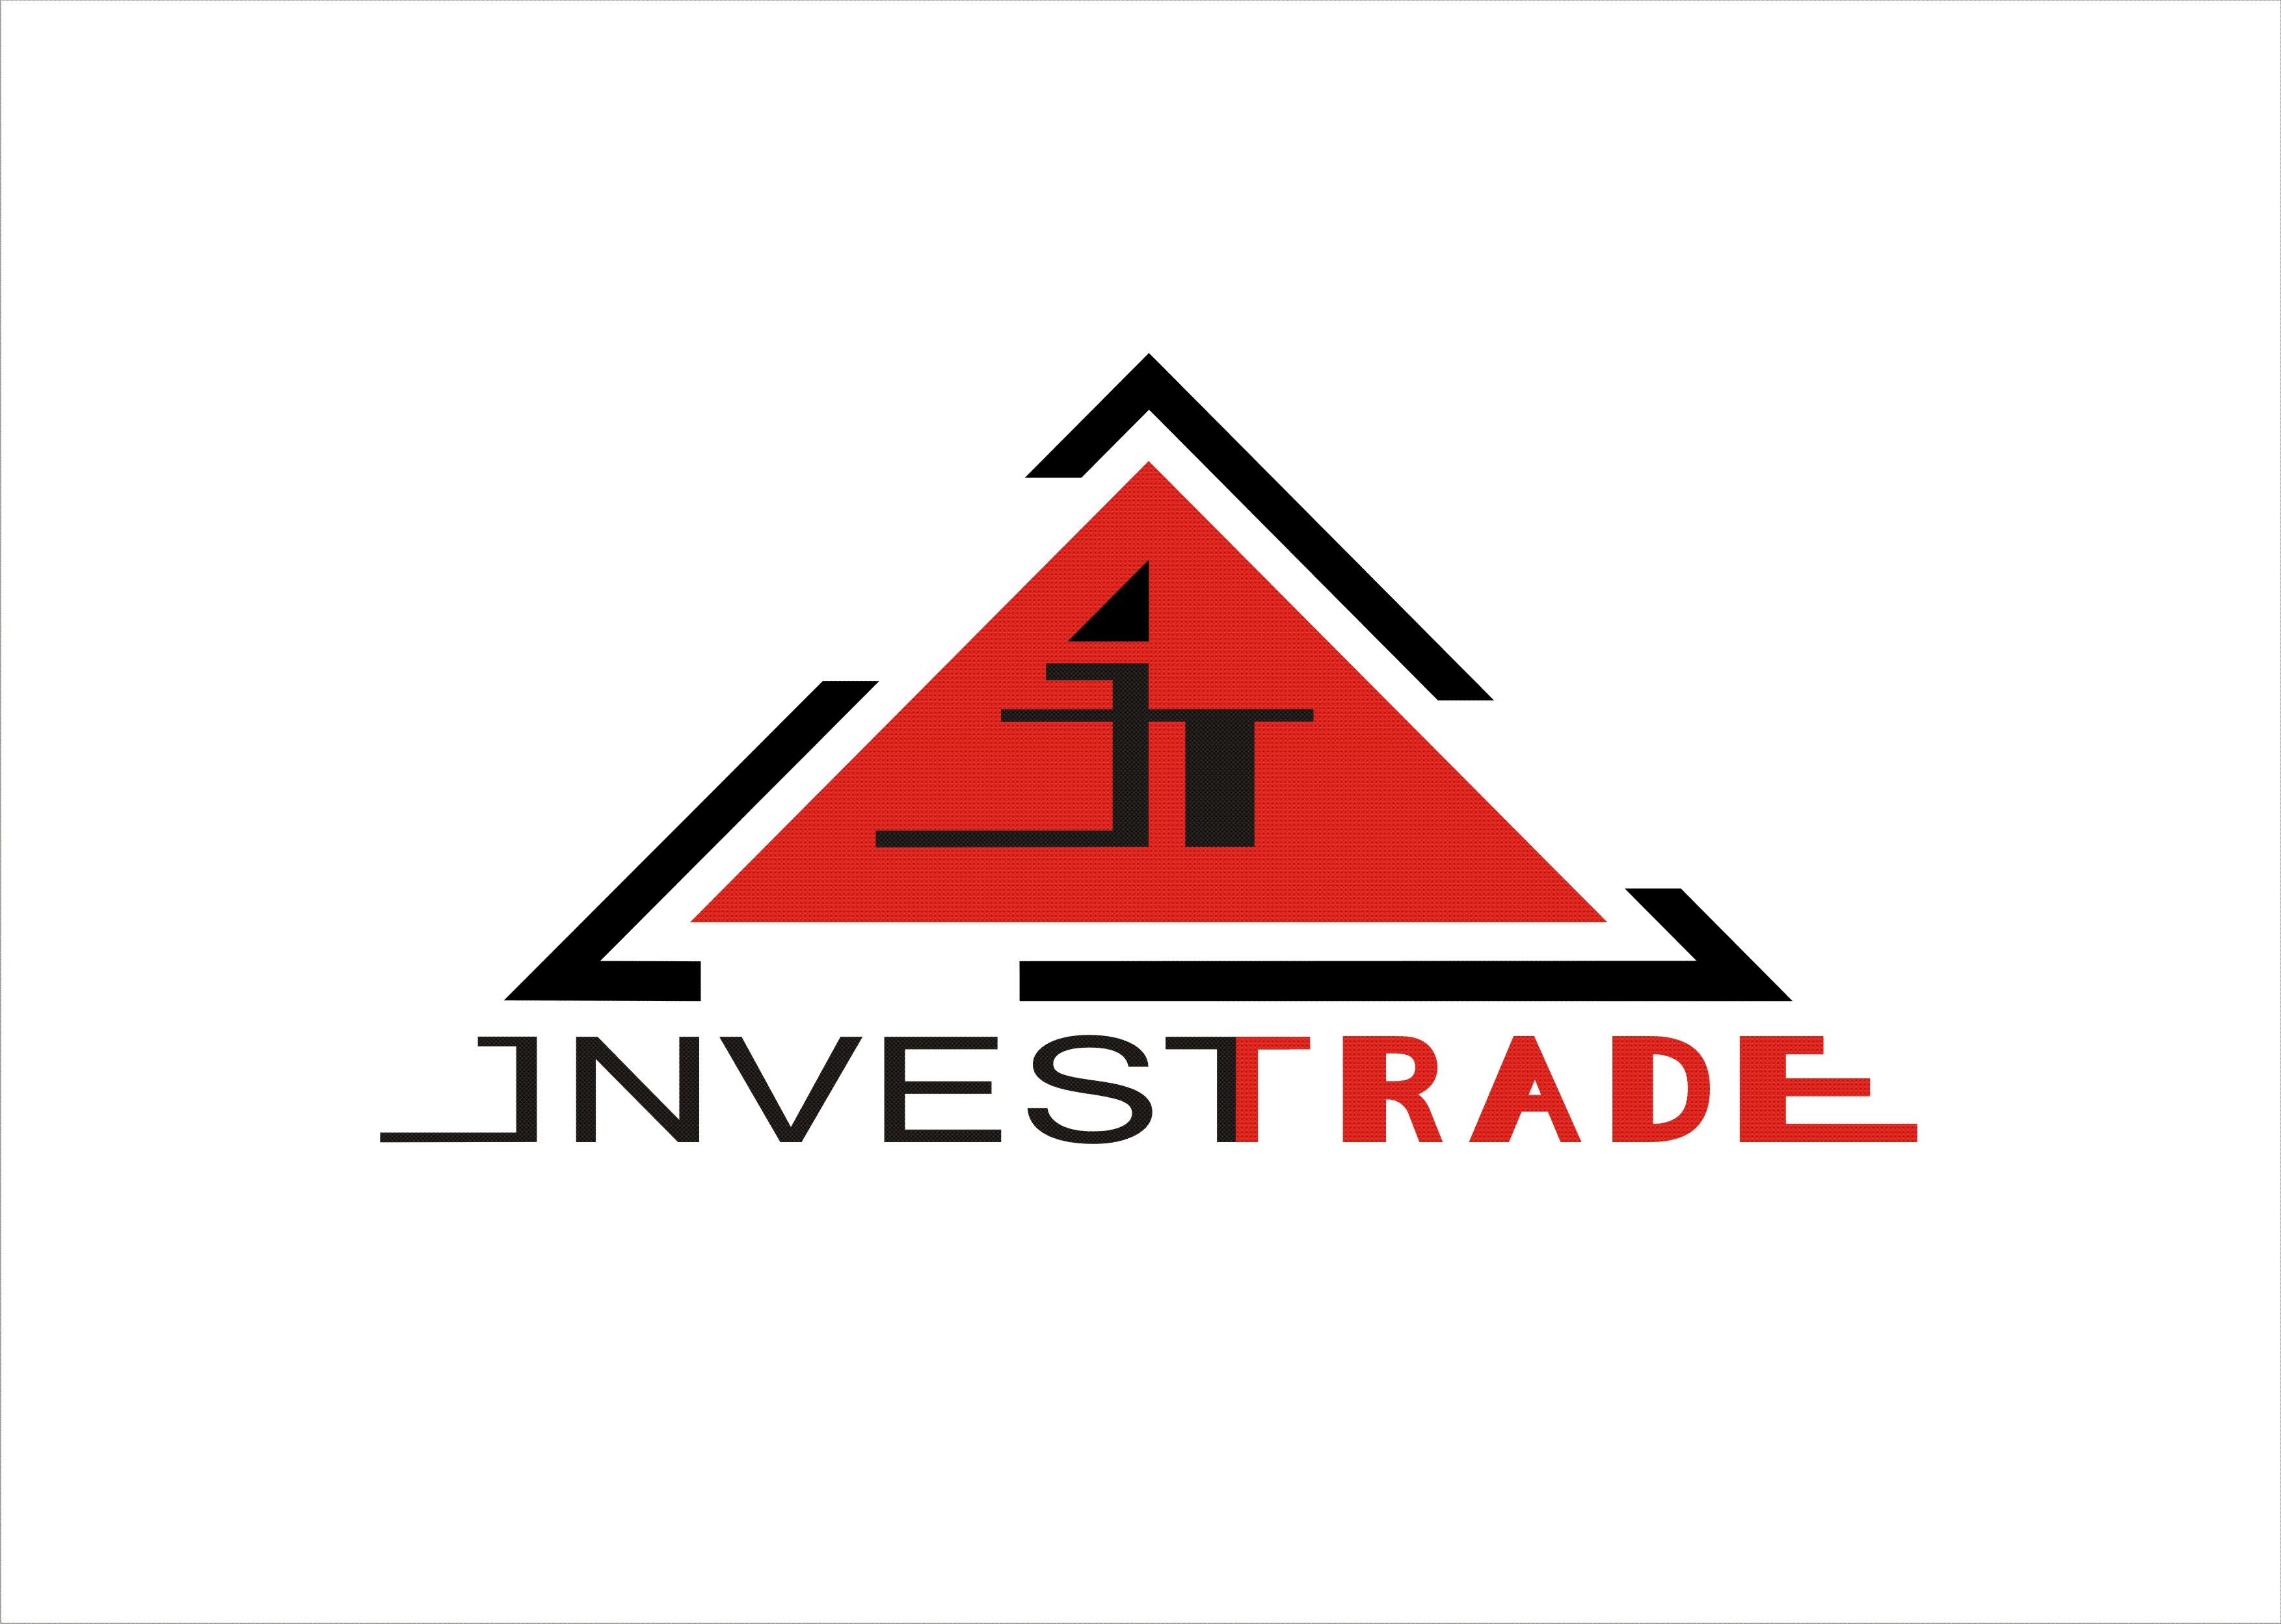 Разработка логотипа для компании Invest trade фото f_511512403e21932d.jpg